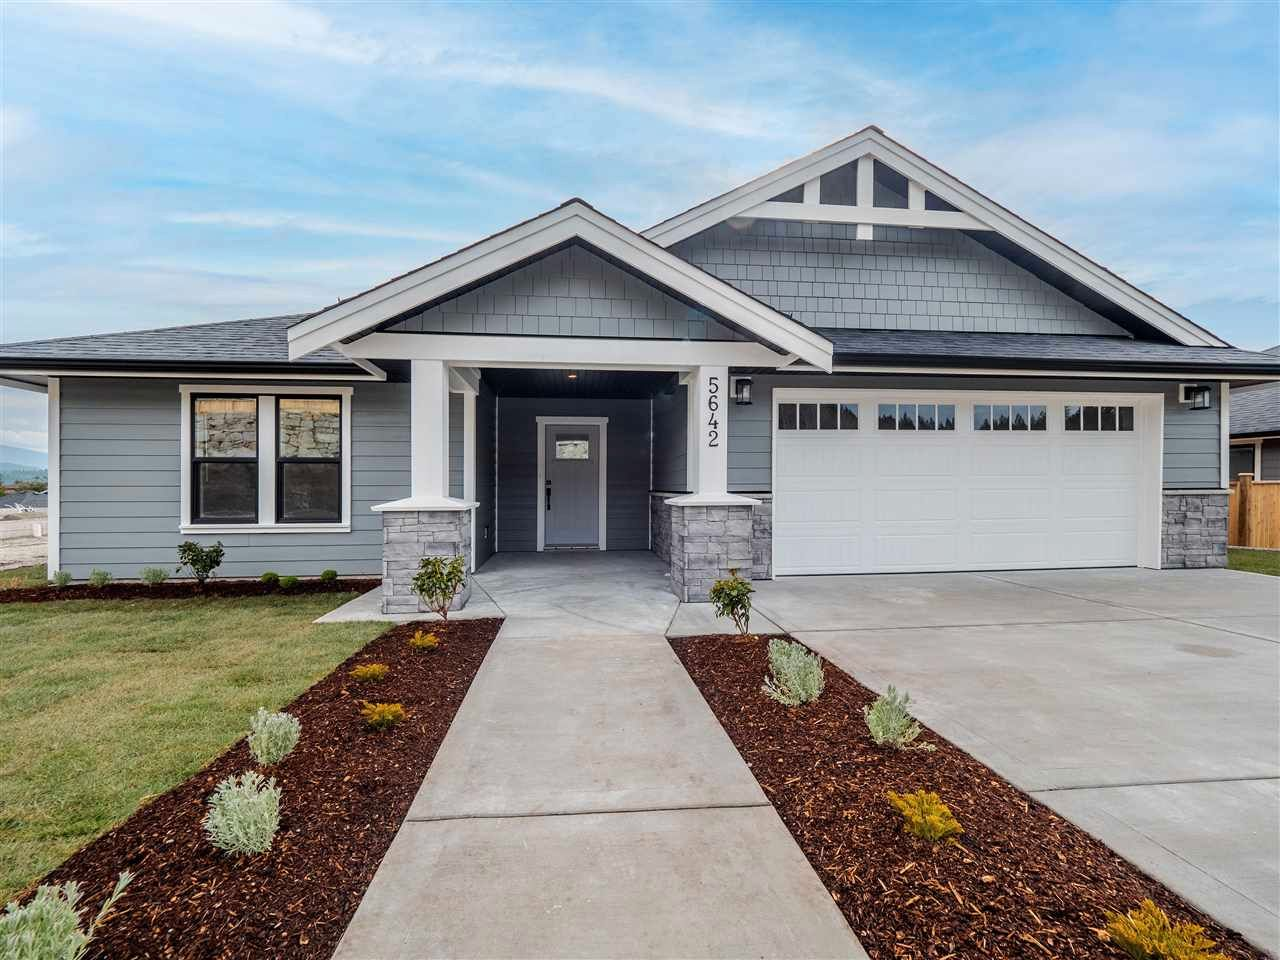 Main Photo: 5662 KINGBIRD Crescent in Sechelt: Sechelt District House for sale (Sunshine Coast)  : MLS®# R2609845